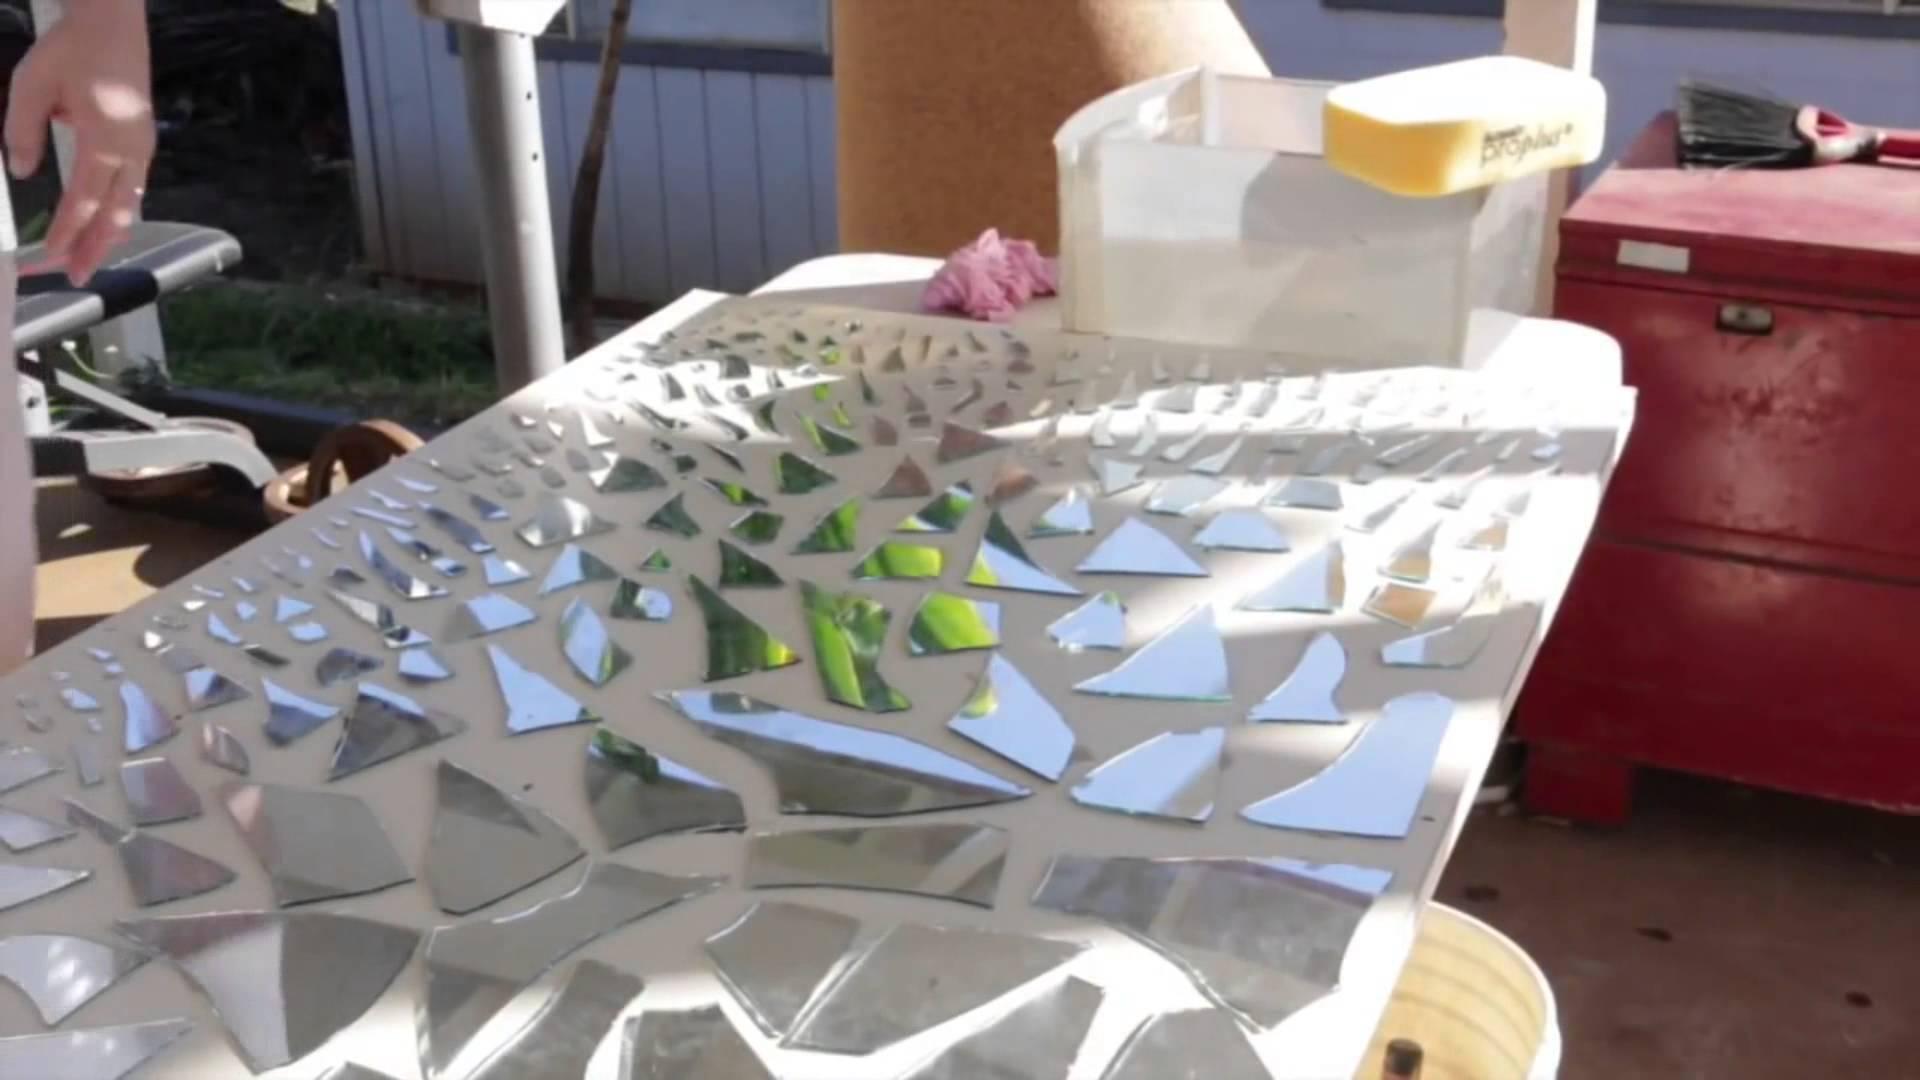 Diy Mirror Mosaic Wall Art – Youtube Throughout Diy Mosaic Wall Art (View 5 of 20)